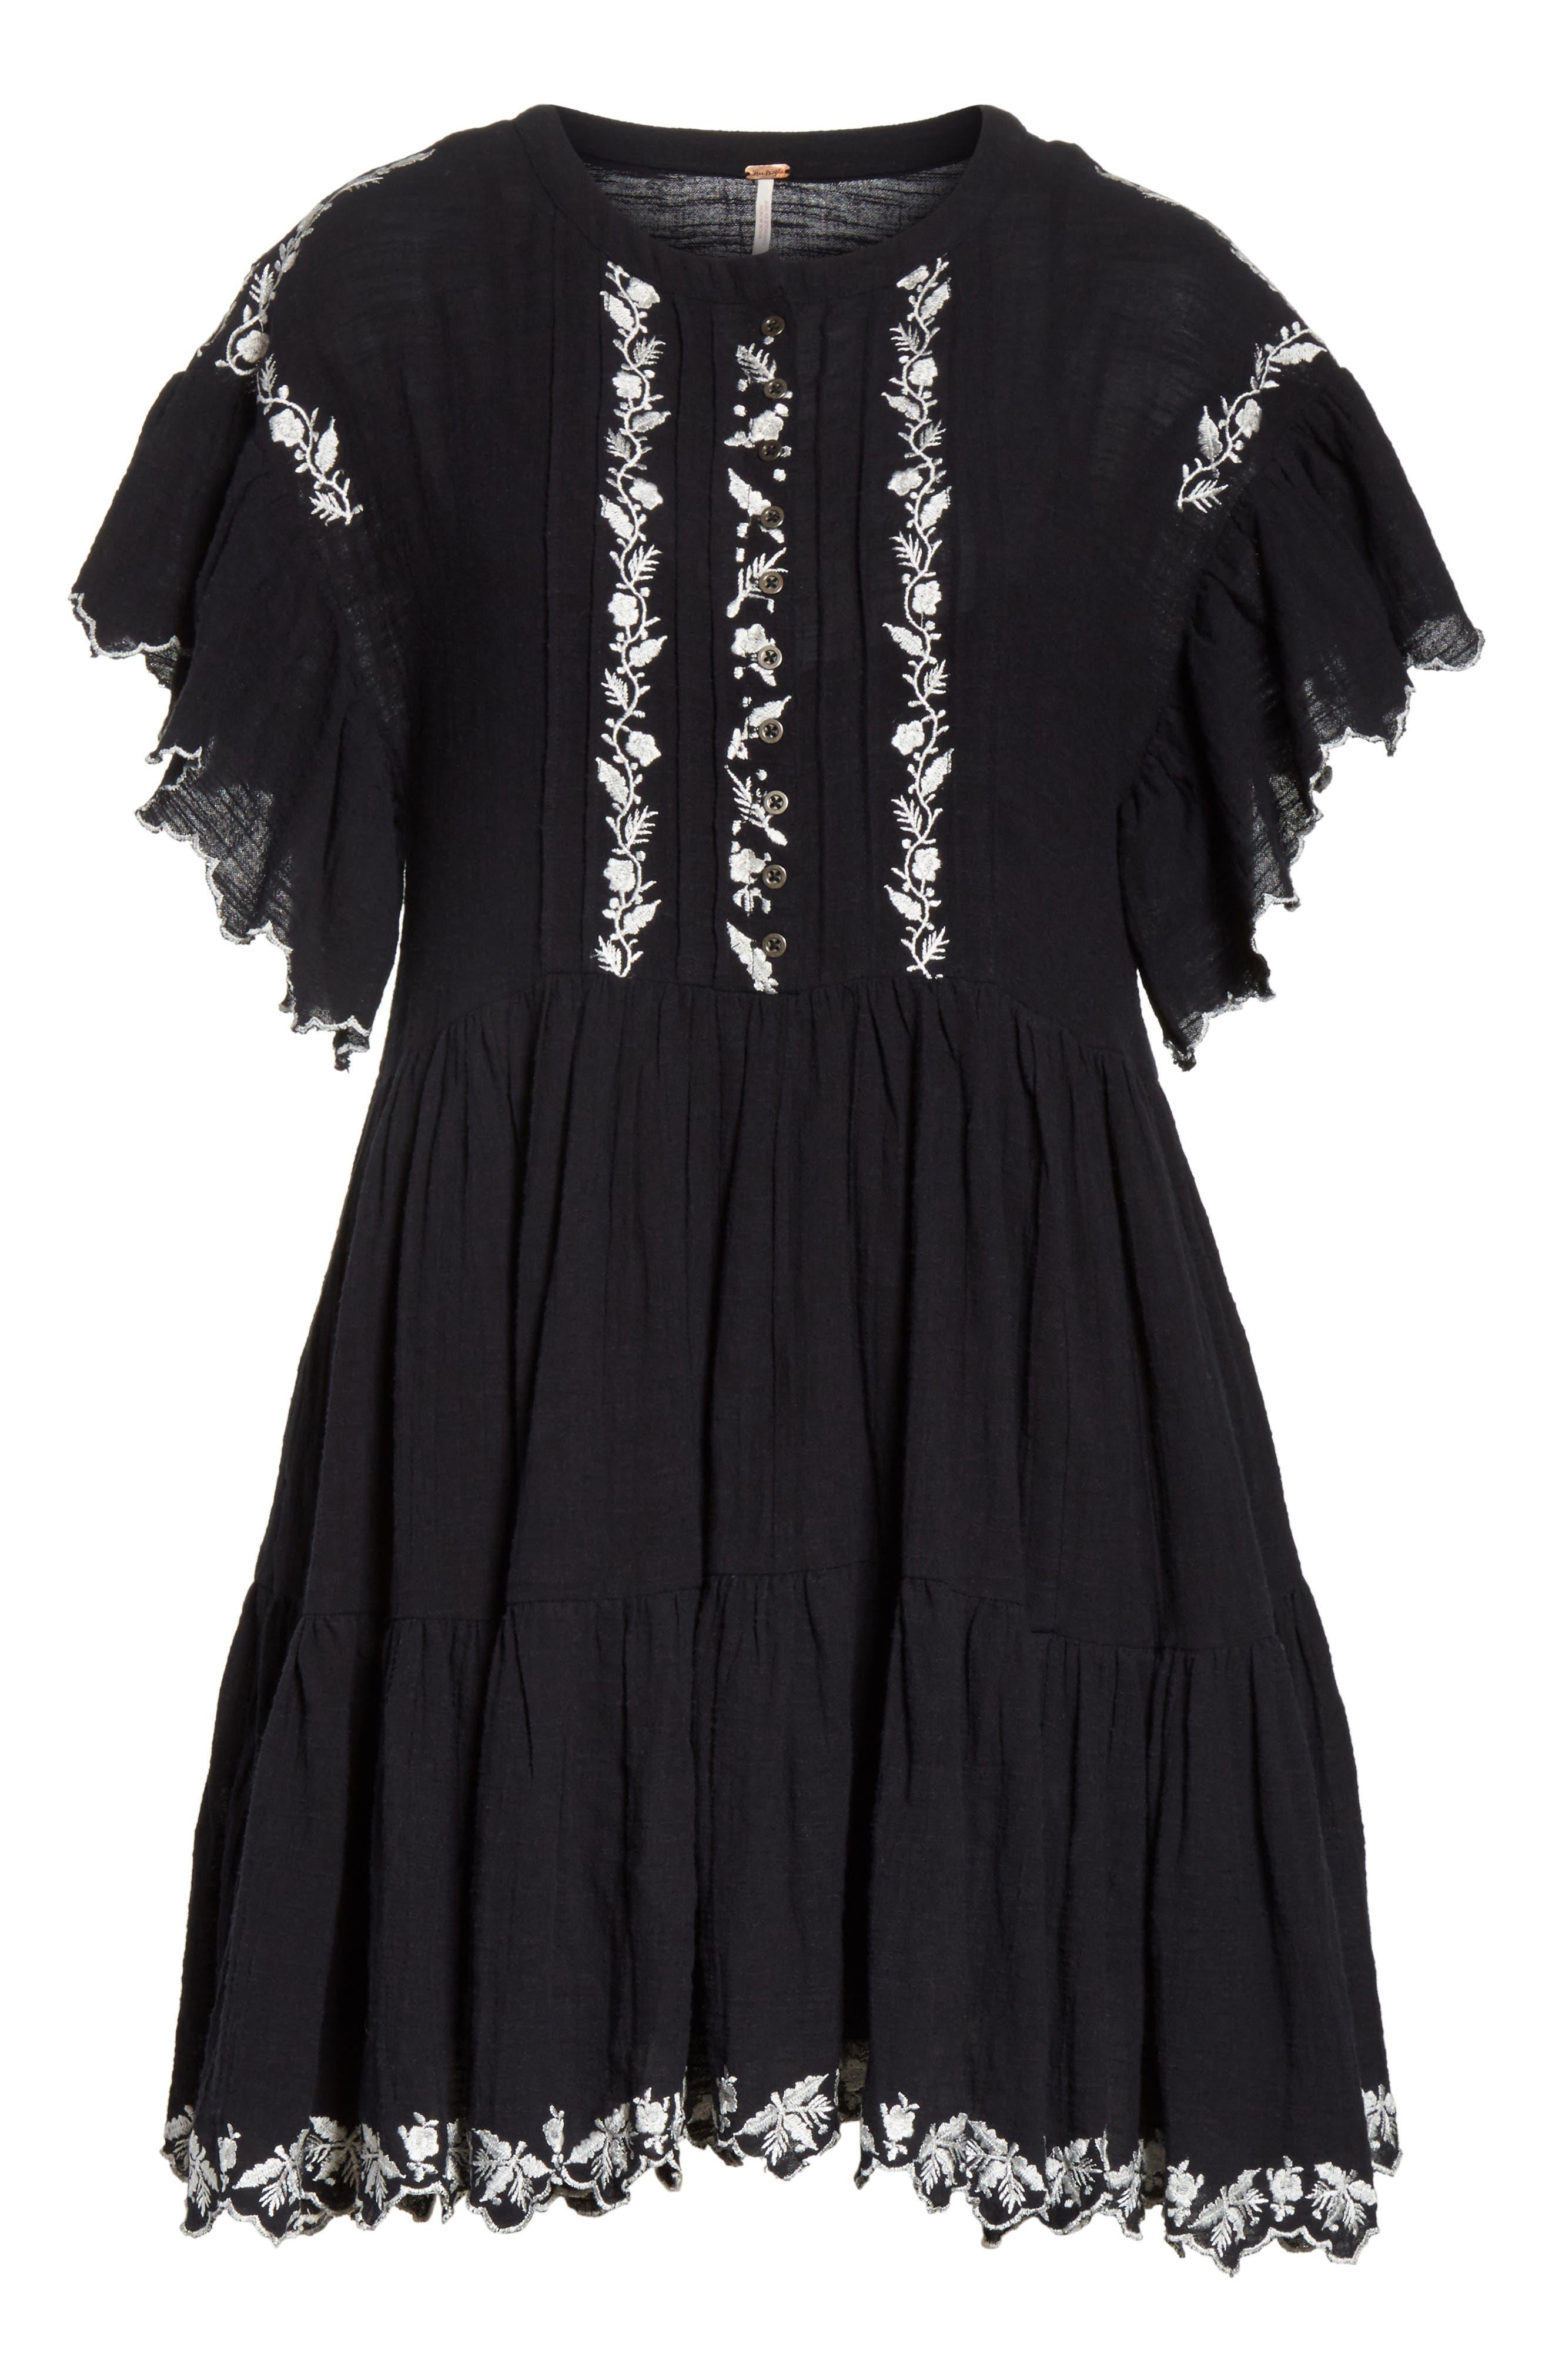 Santiago Embroidered Minidress,                             Alternate thumbnail 6, color,                             Black